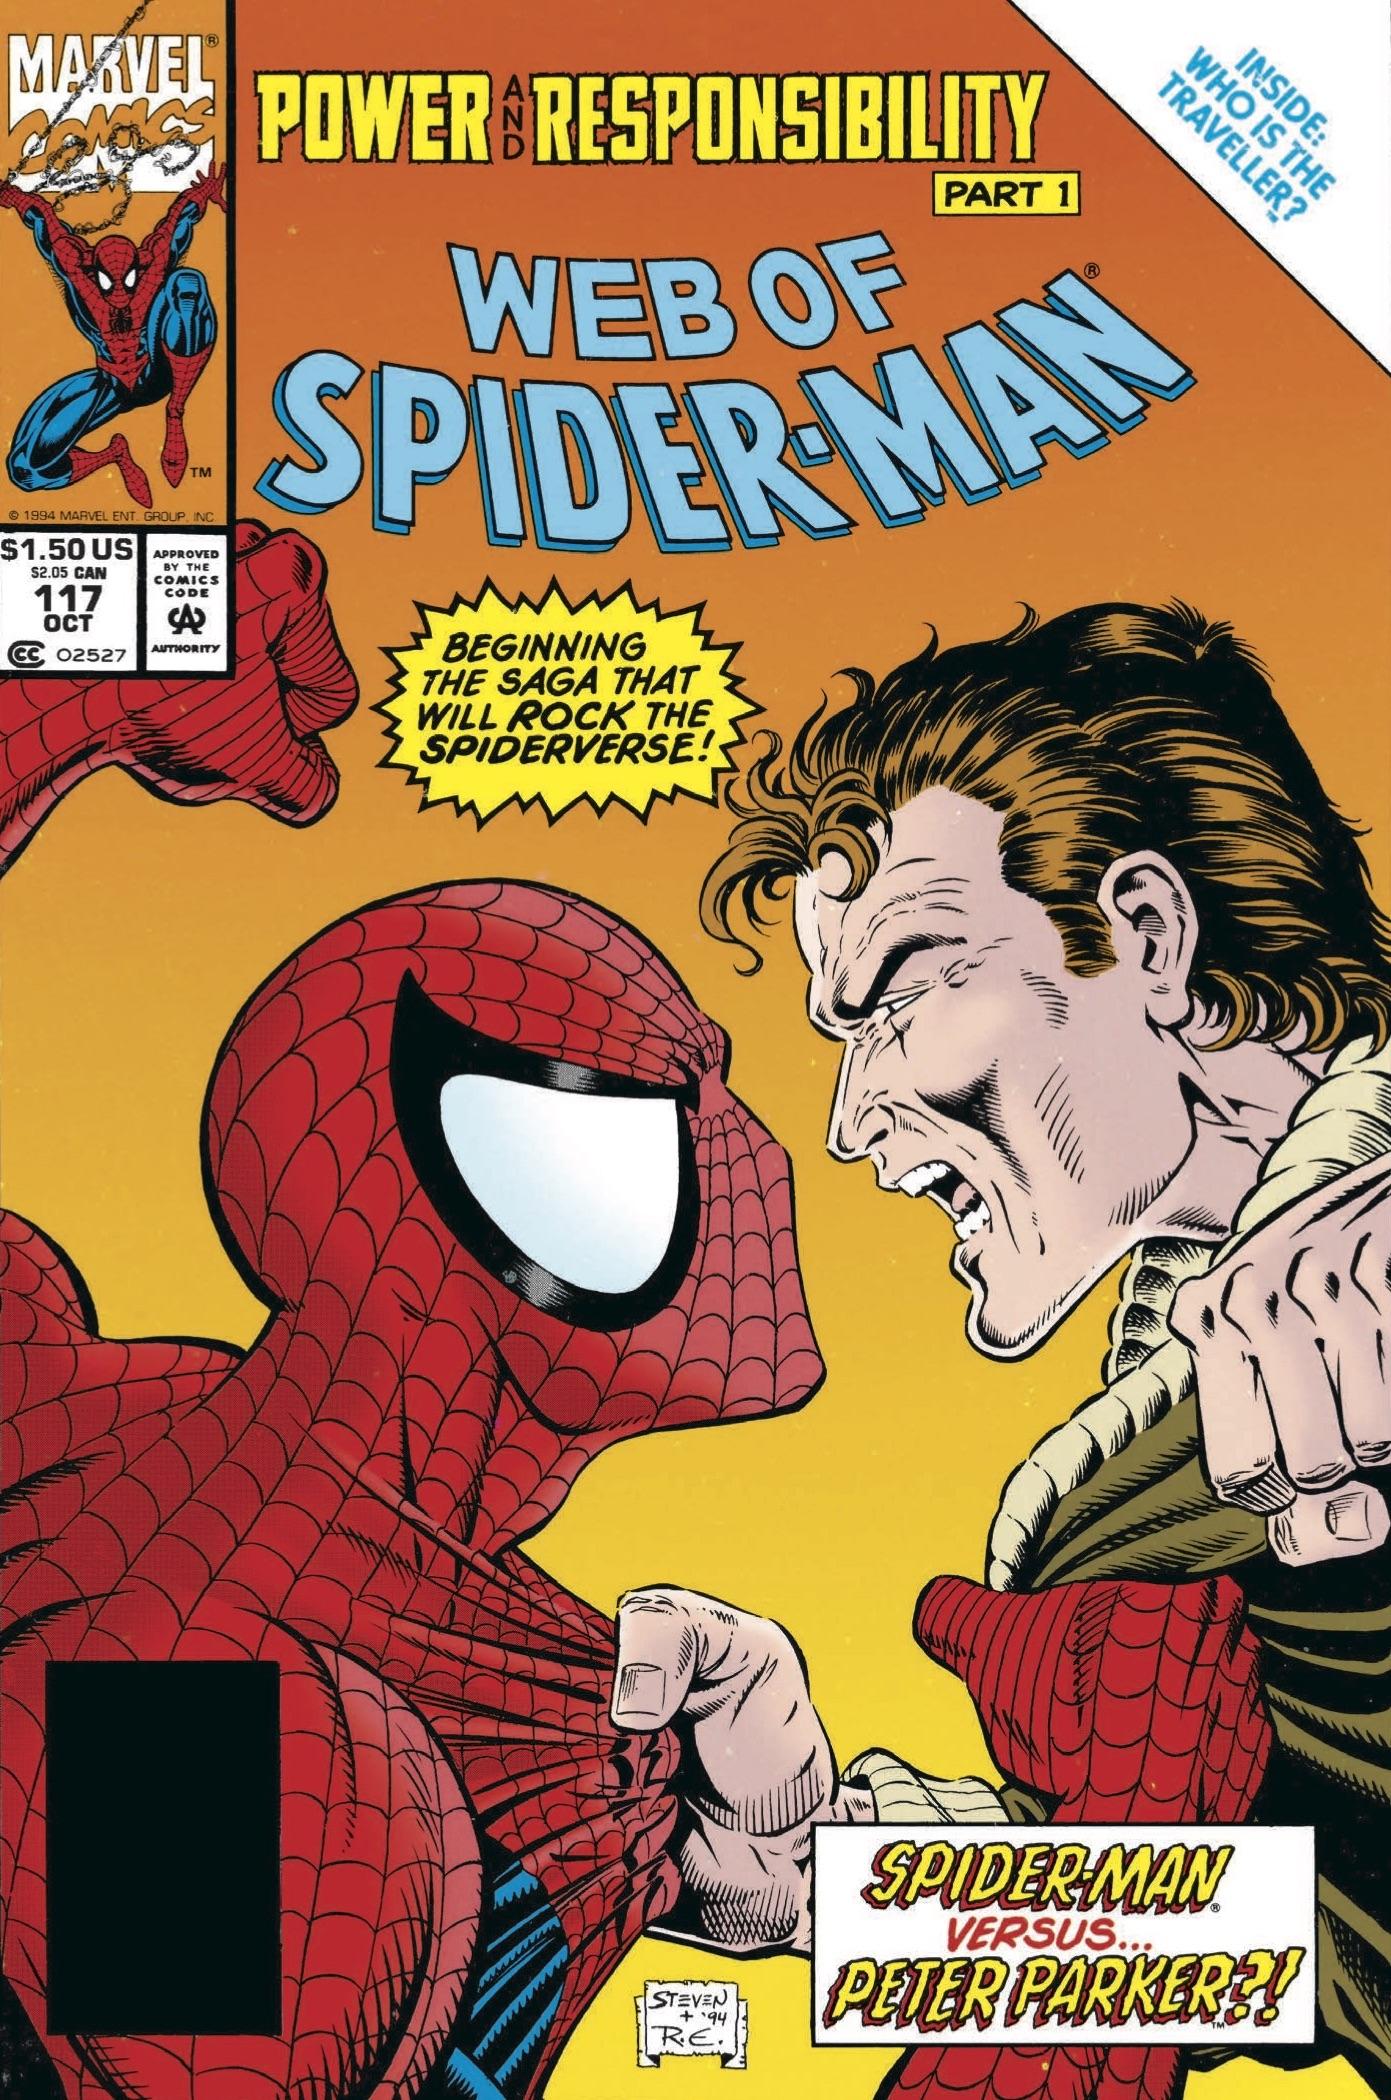 Sneak Peek: Spider-Man art book gives the web-slinger star treatment